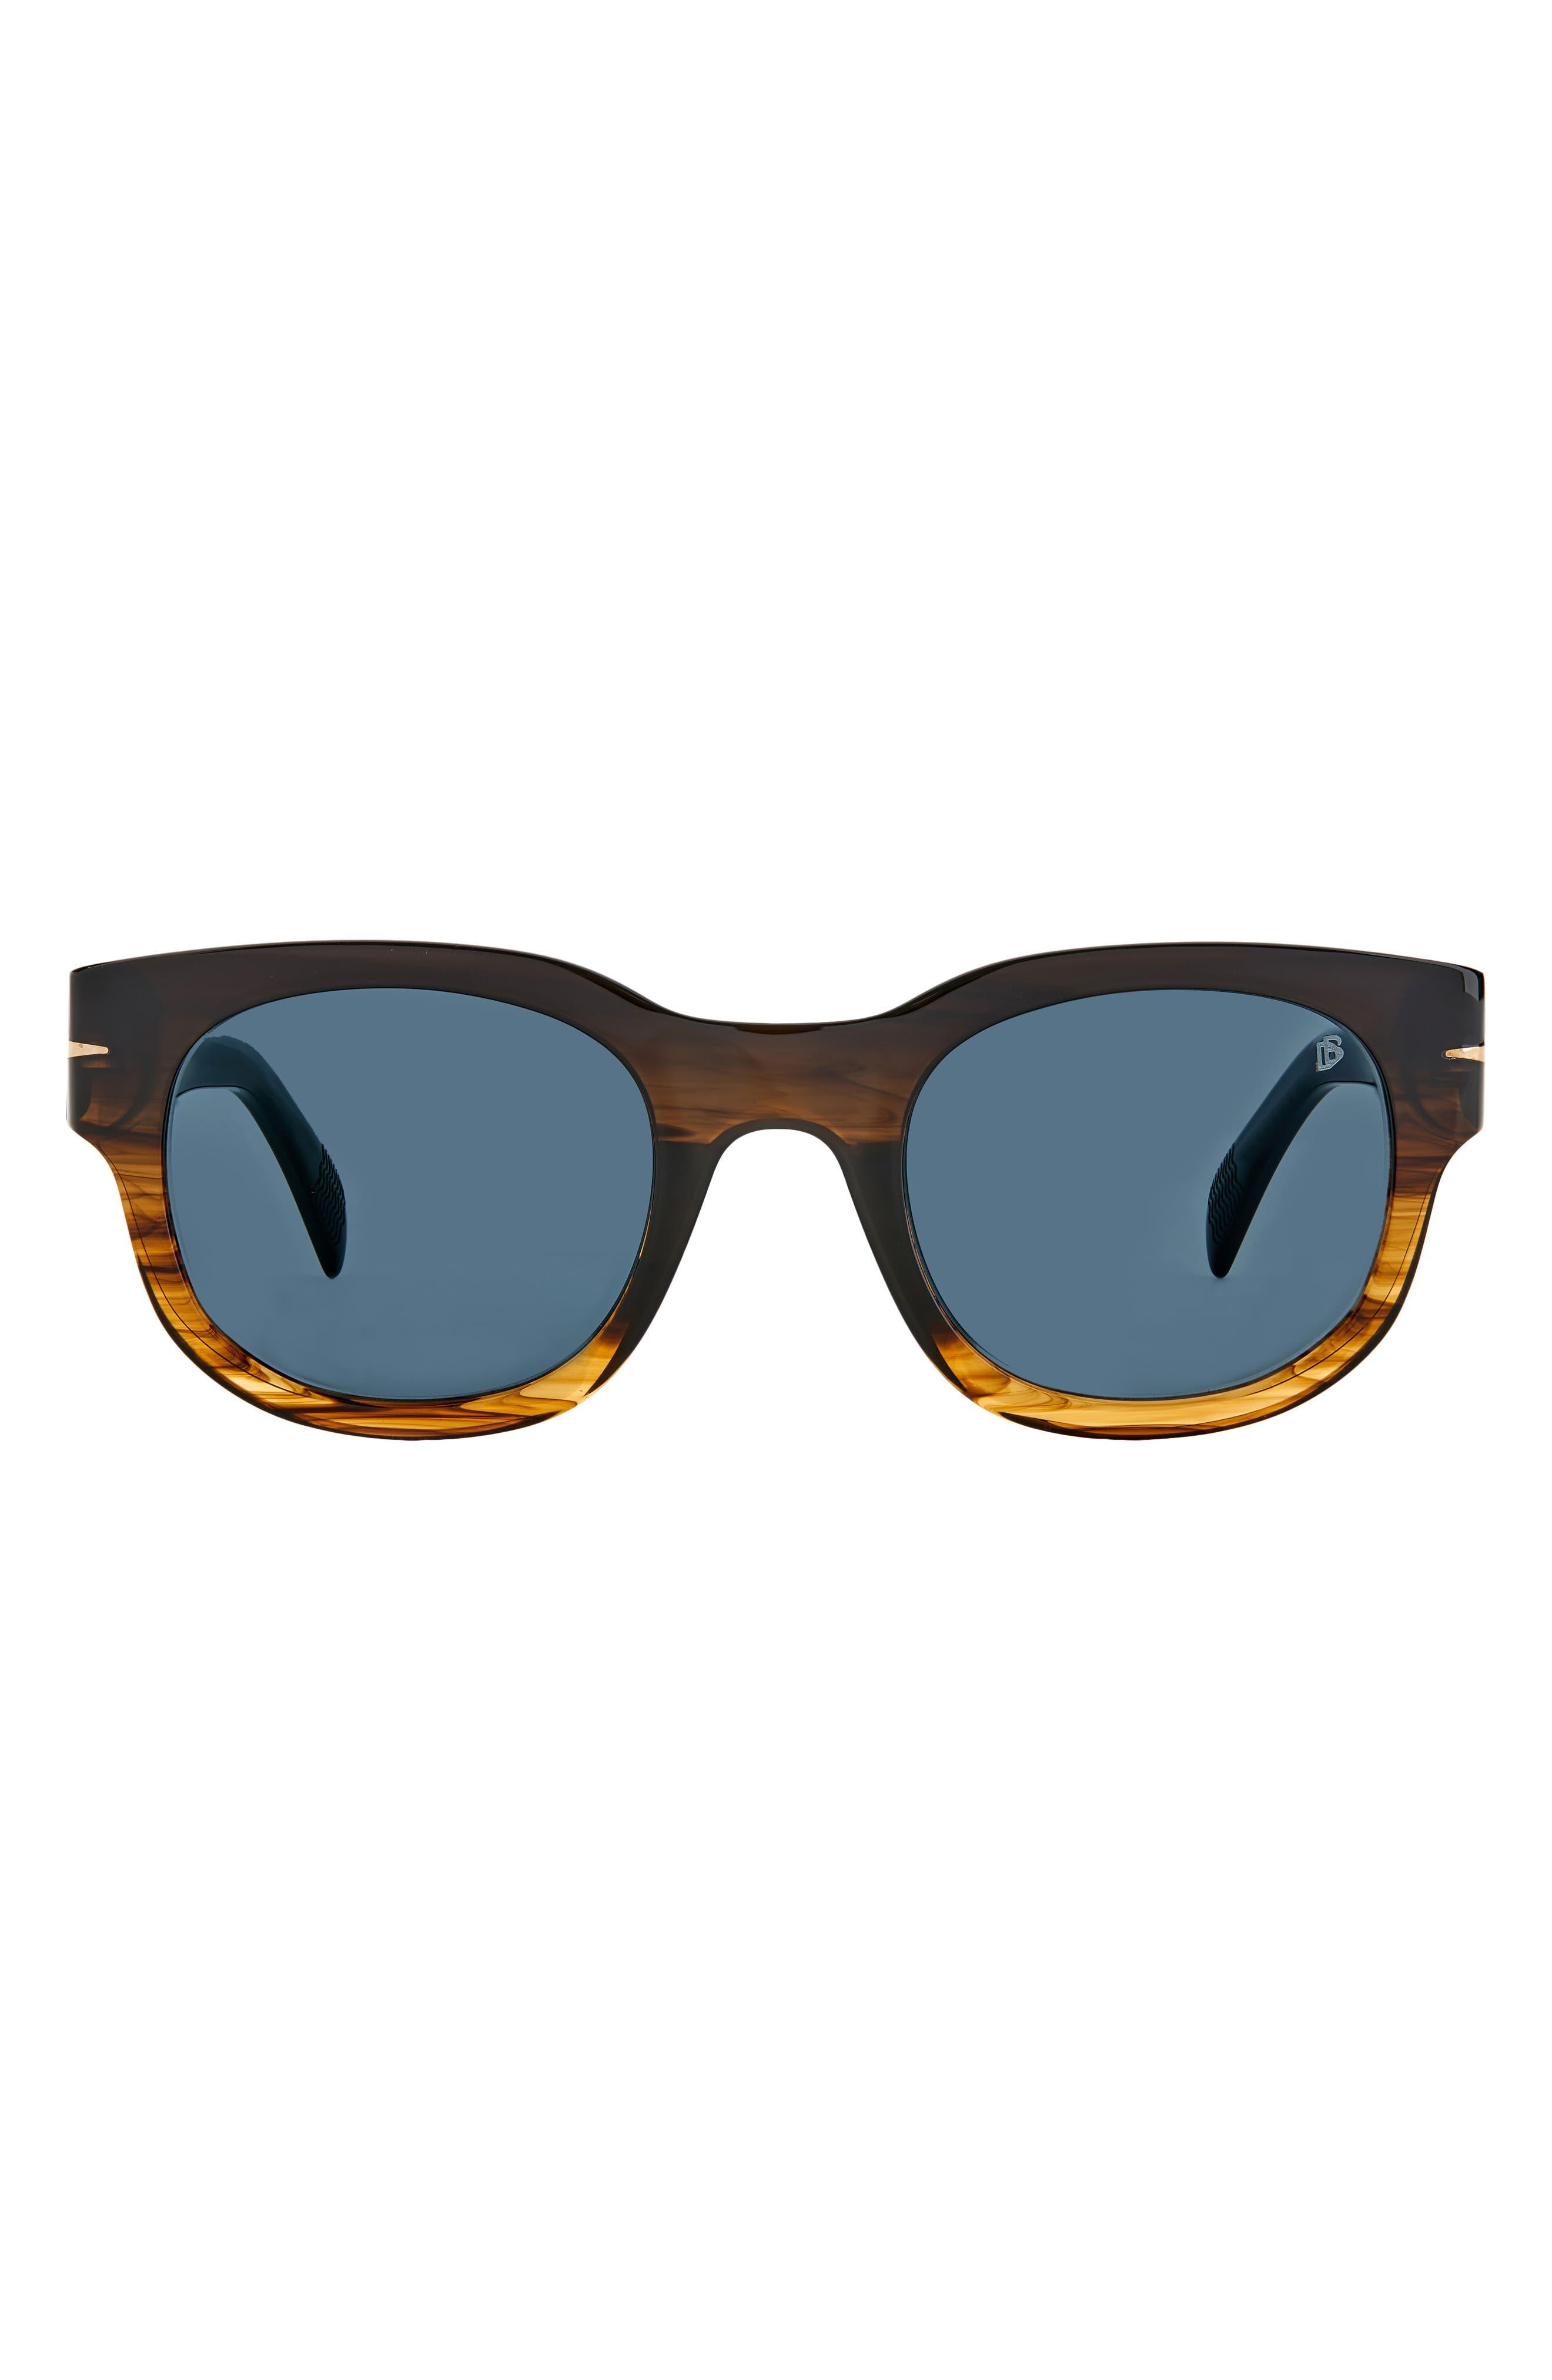 Men's David Beckham 49mm Rectangular Sunglasses